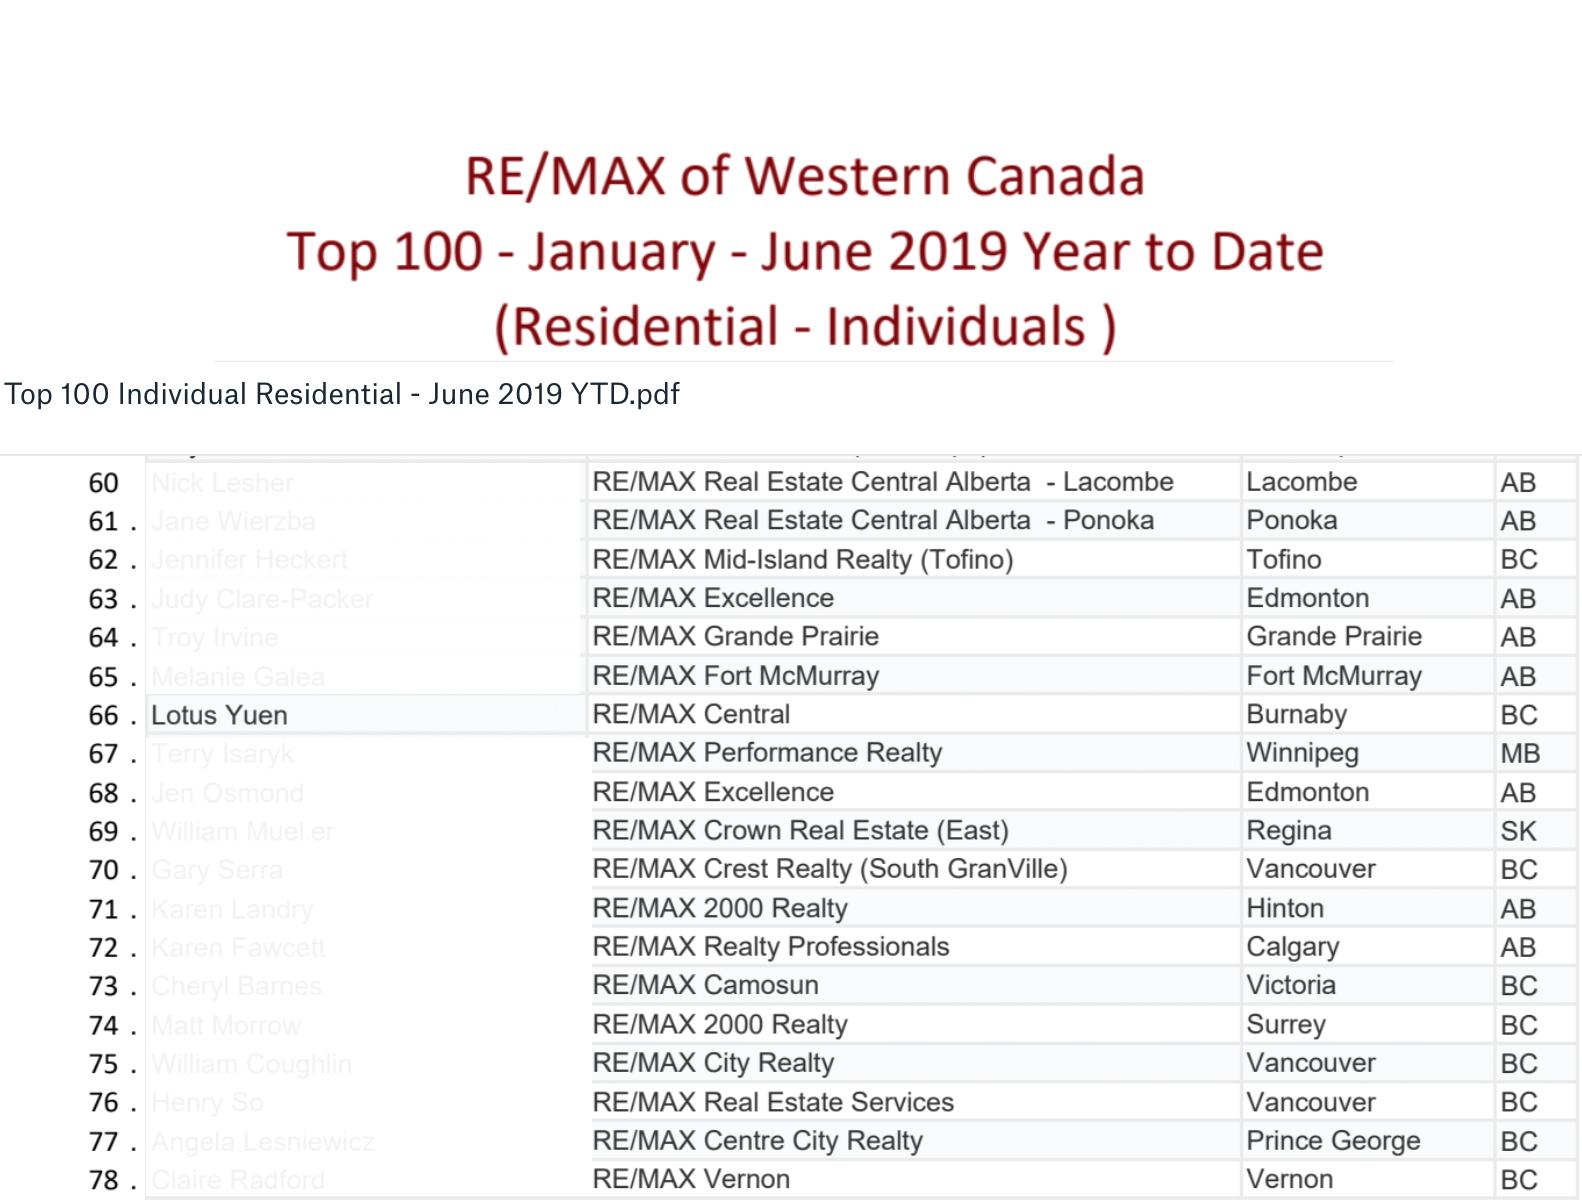 Top 100 Western Remax Jan-Jun 2019